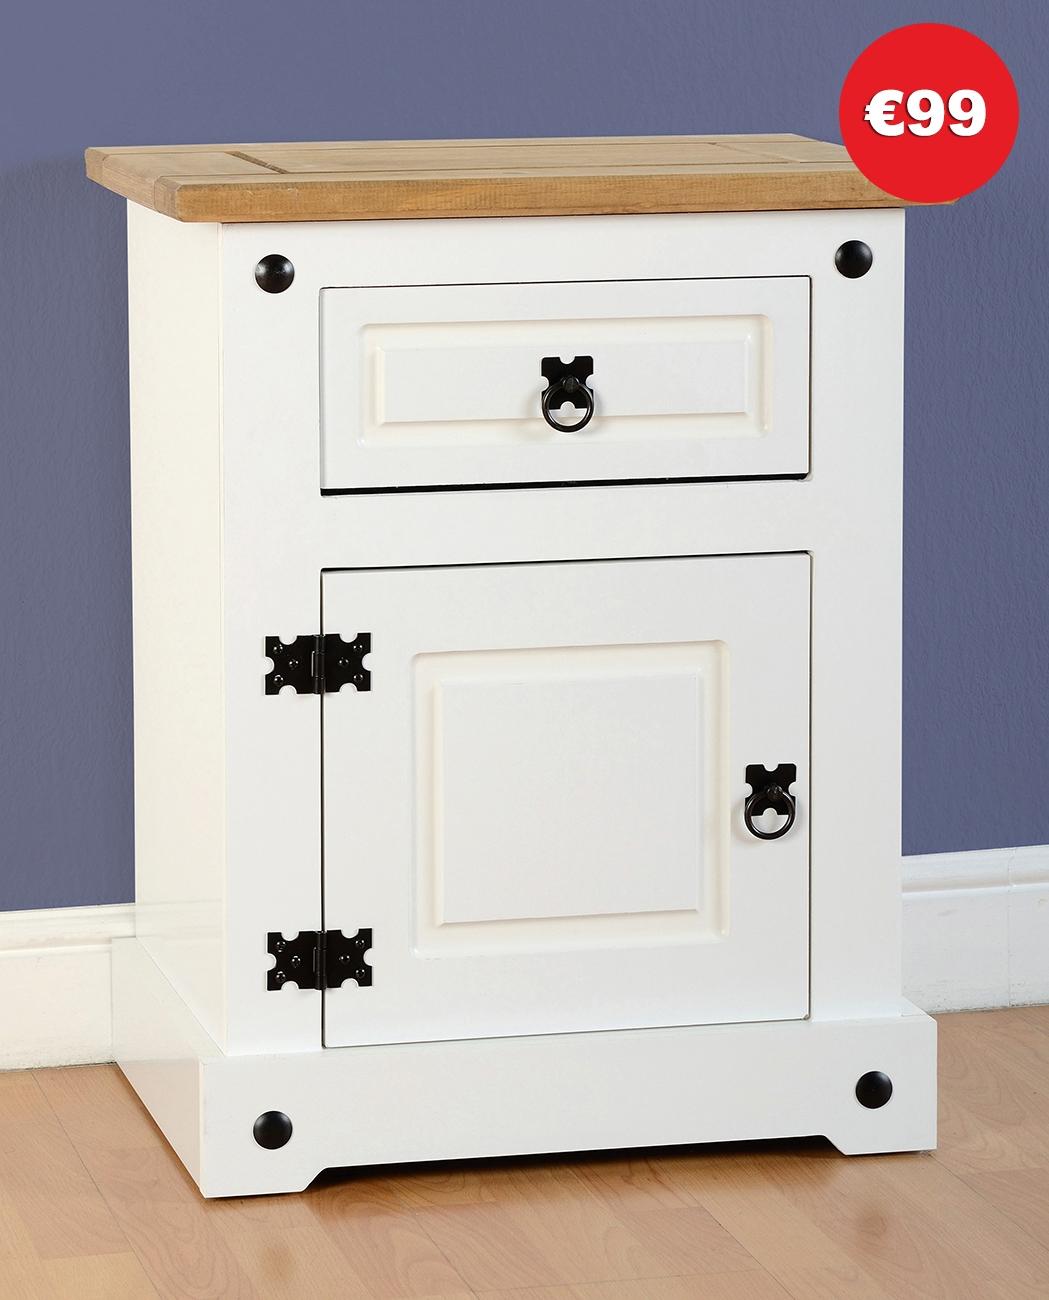 Locker Bedroom Furniture Bedroom Furniture For Sale In Dundalk Co Louth